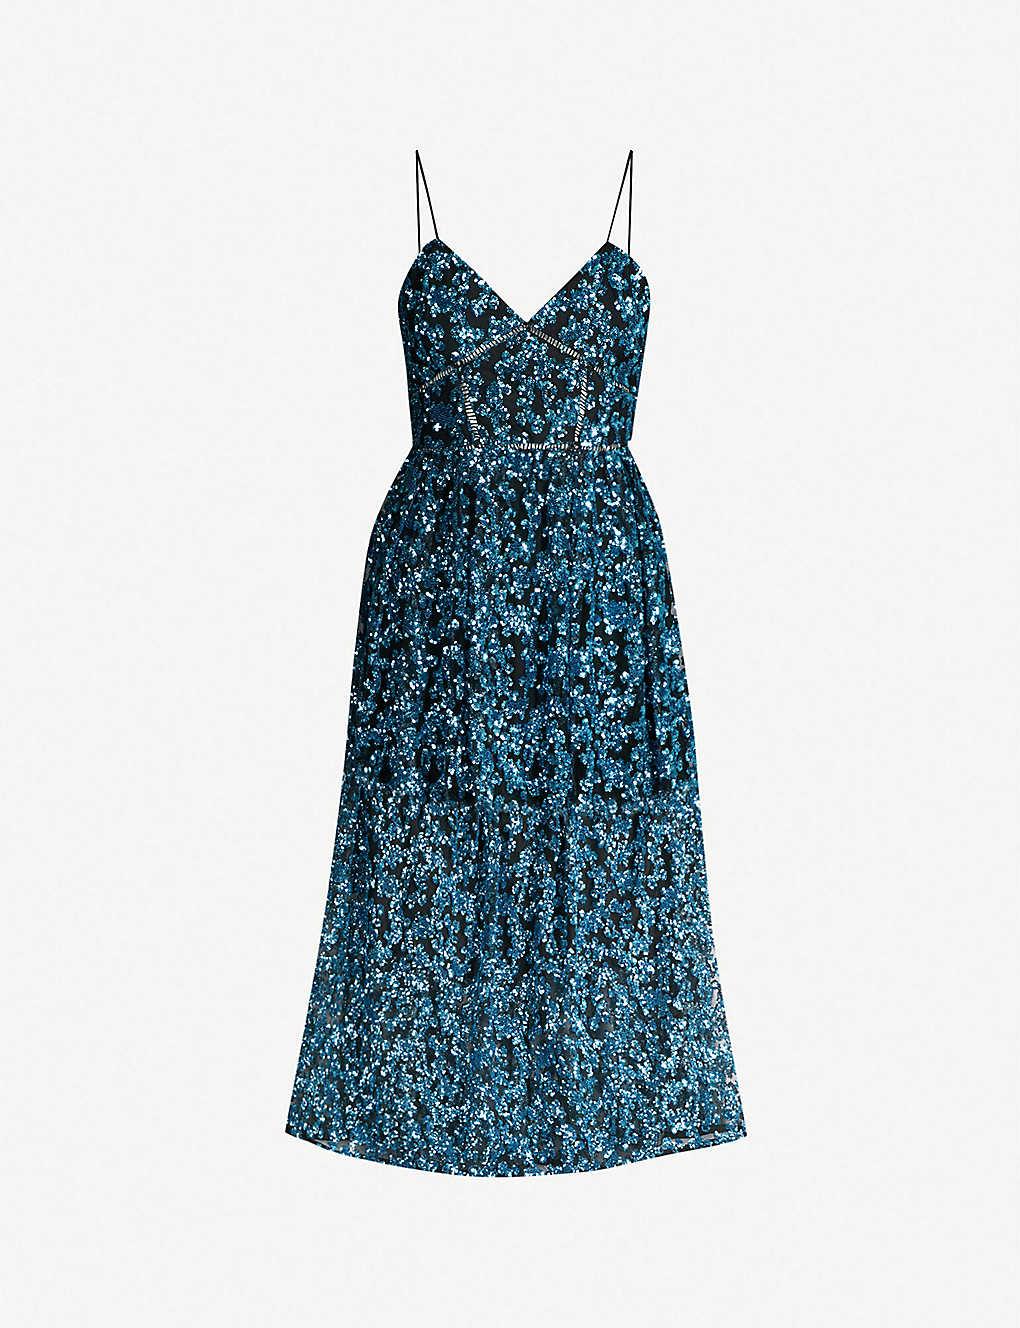 2d32a32190d255 SELF-PORTRAIT - Sequin azaelea midi dress